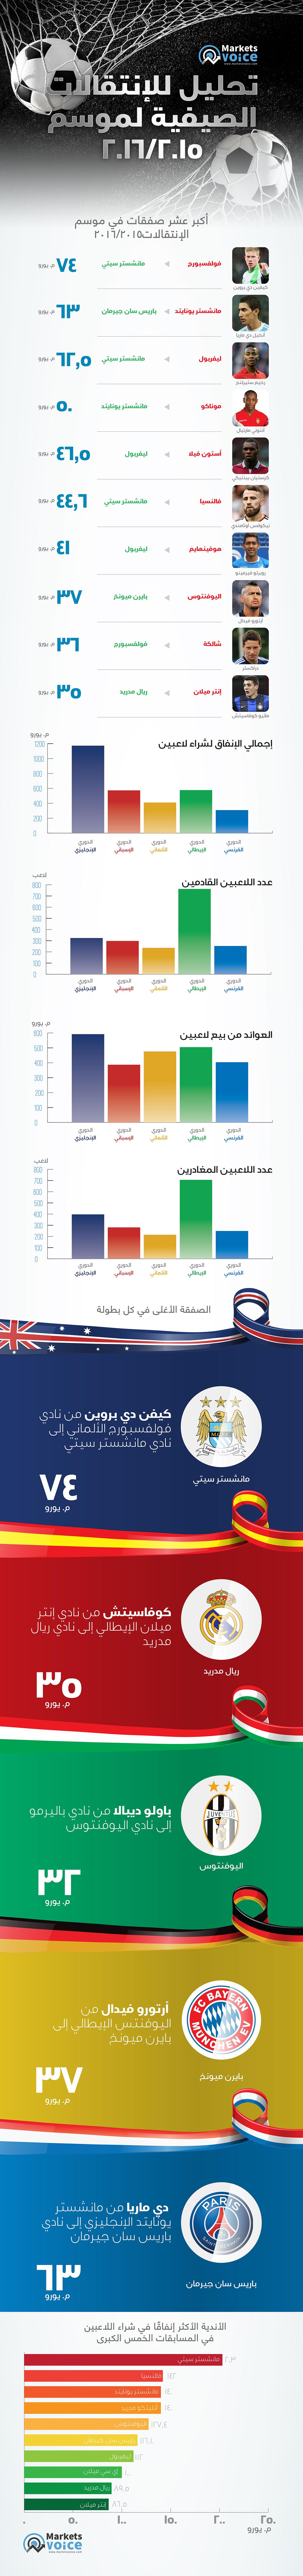 All Football Players Transfers 2015/2016 - infographic saeed elgarf Saeed